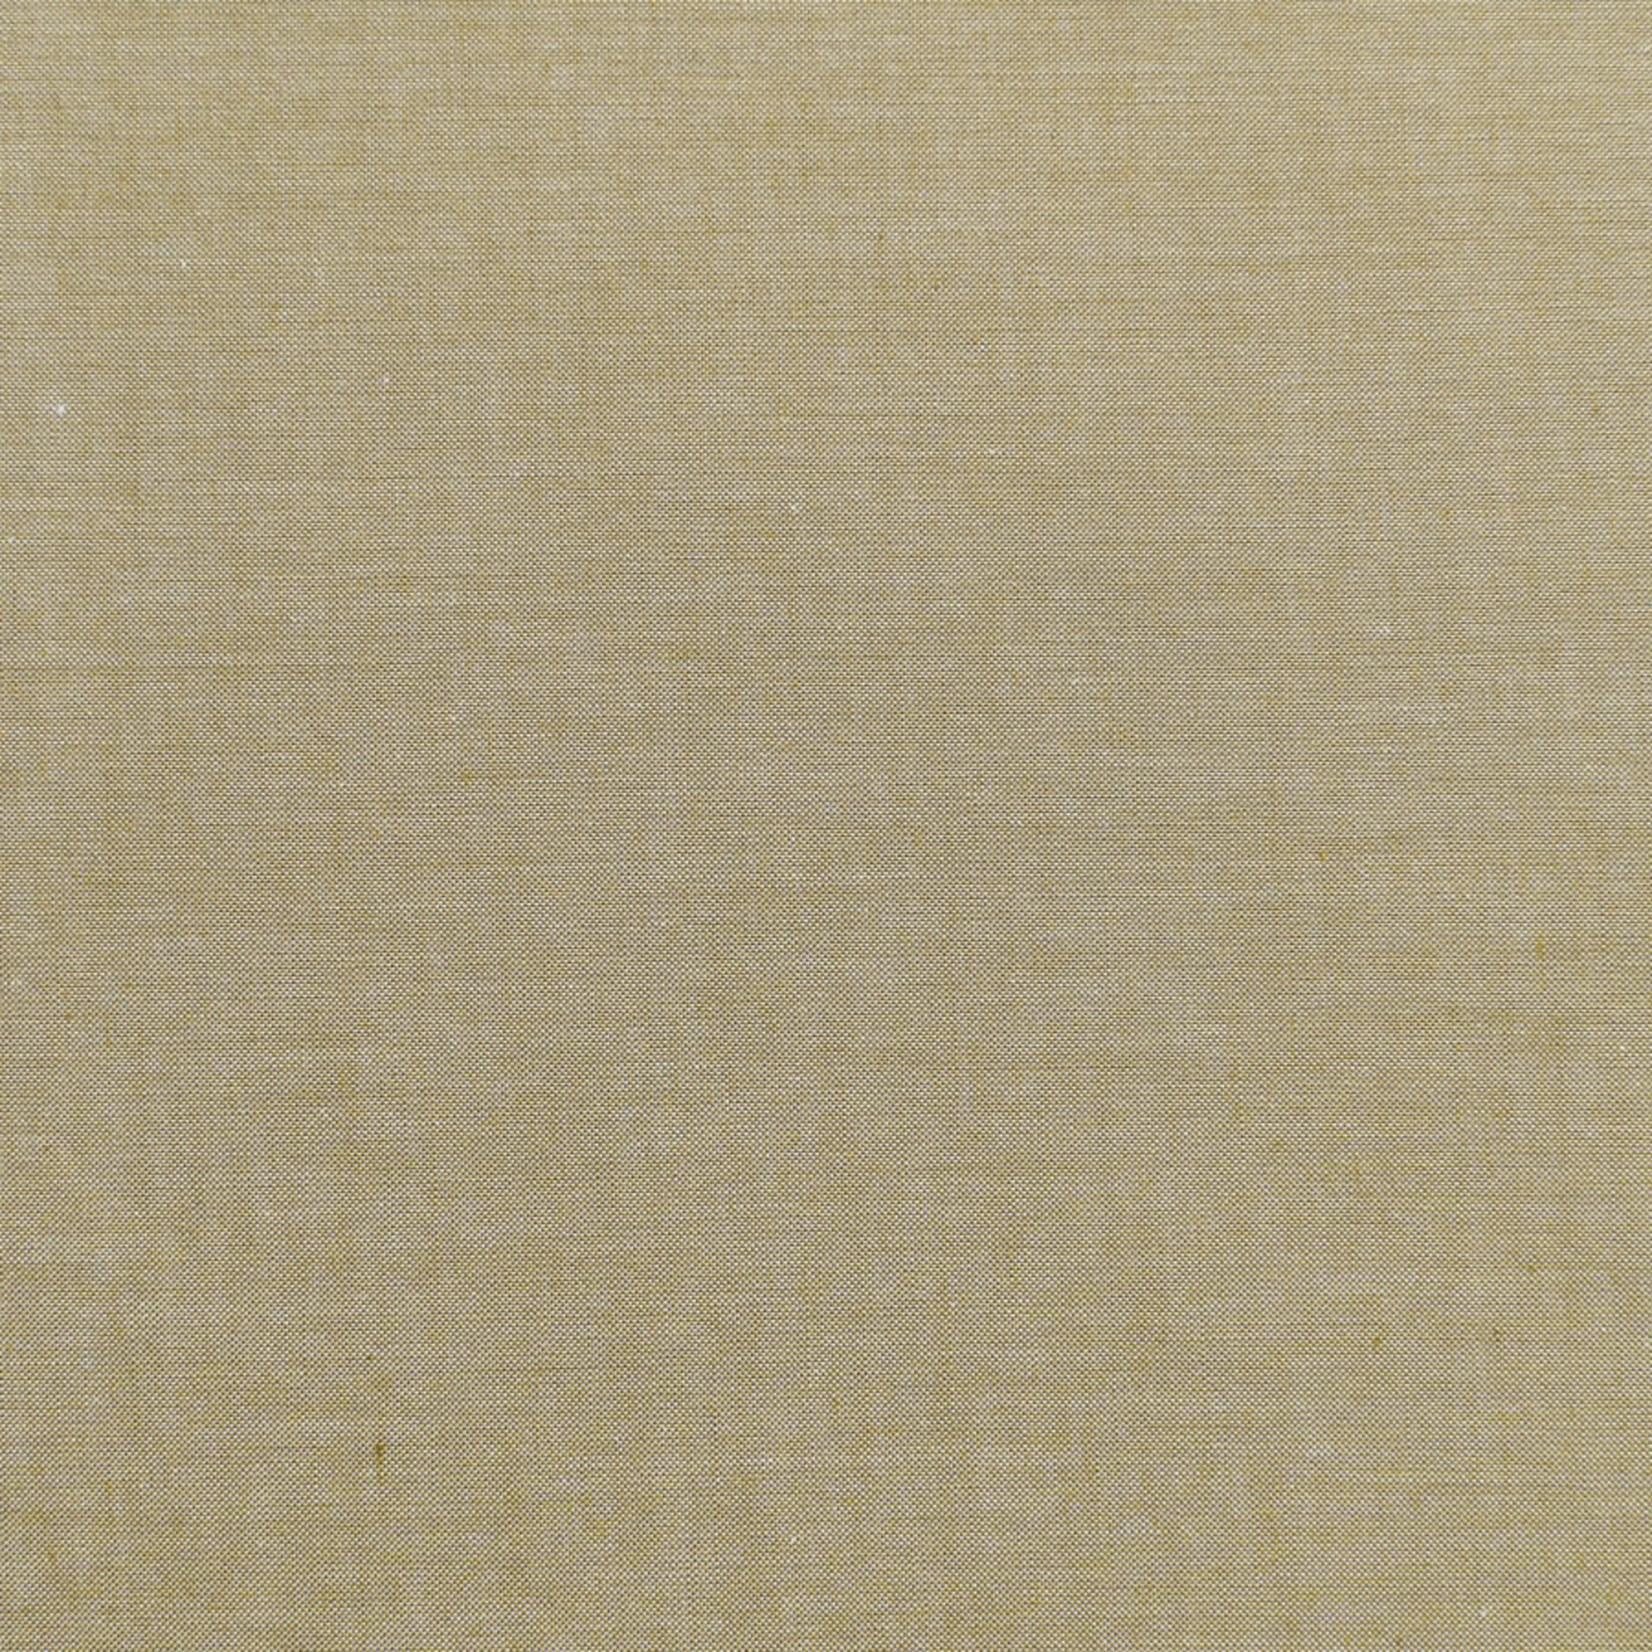 Tilda Tilda Basics, Chambray, Olive 160012 $0.22 per cm or $22/m